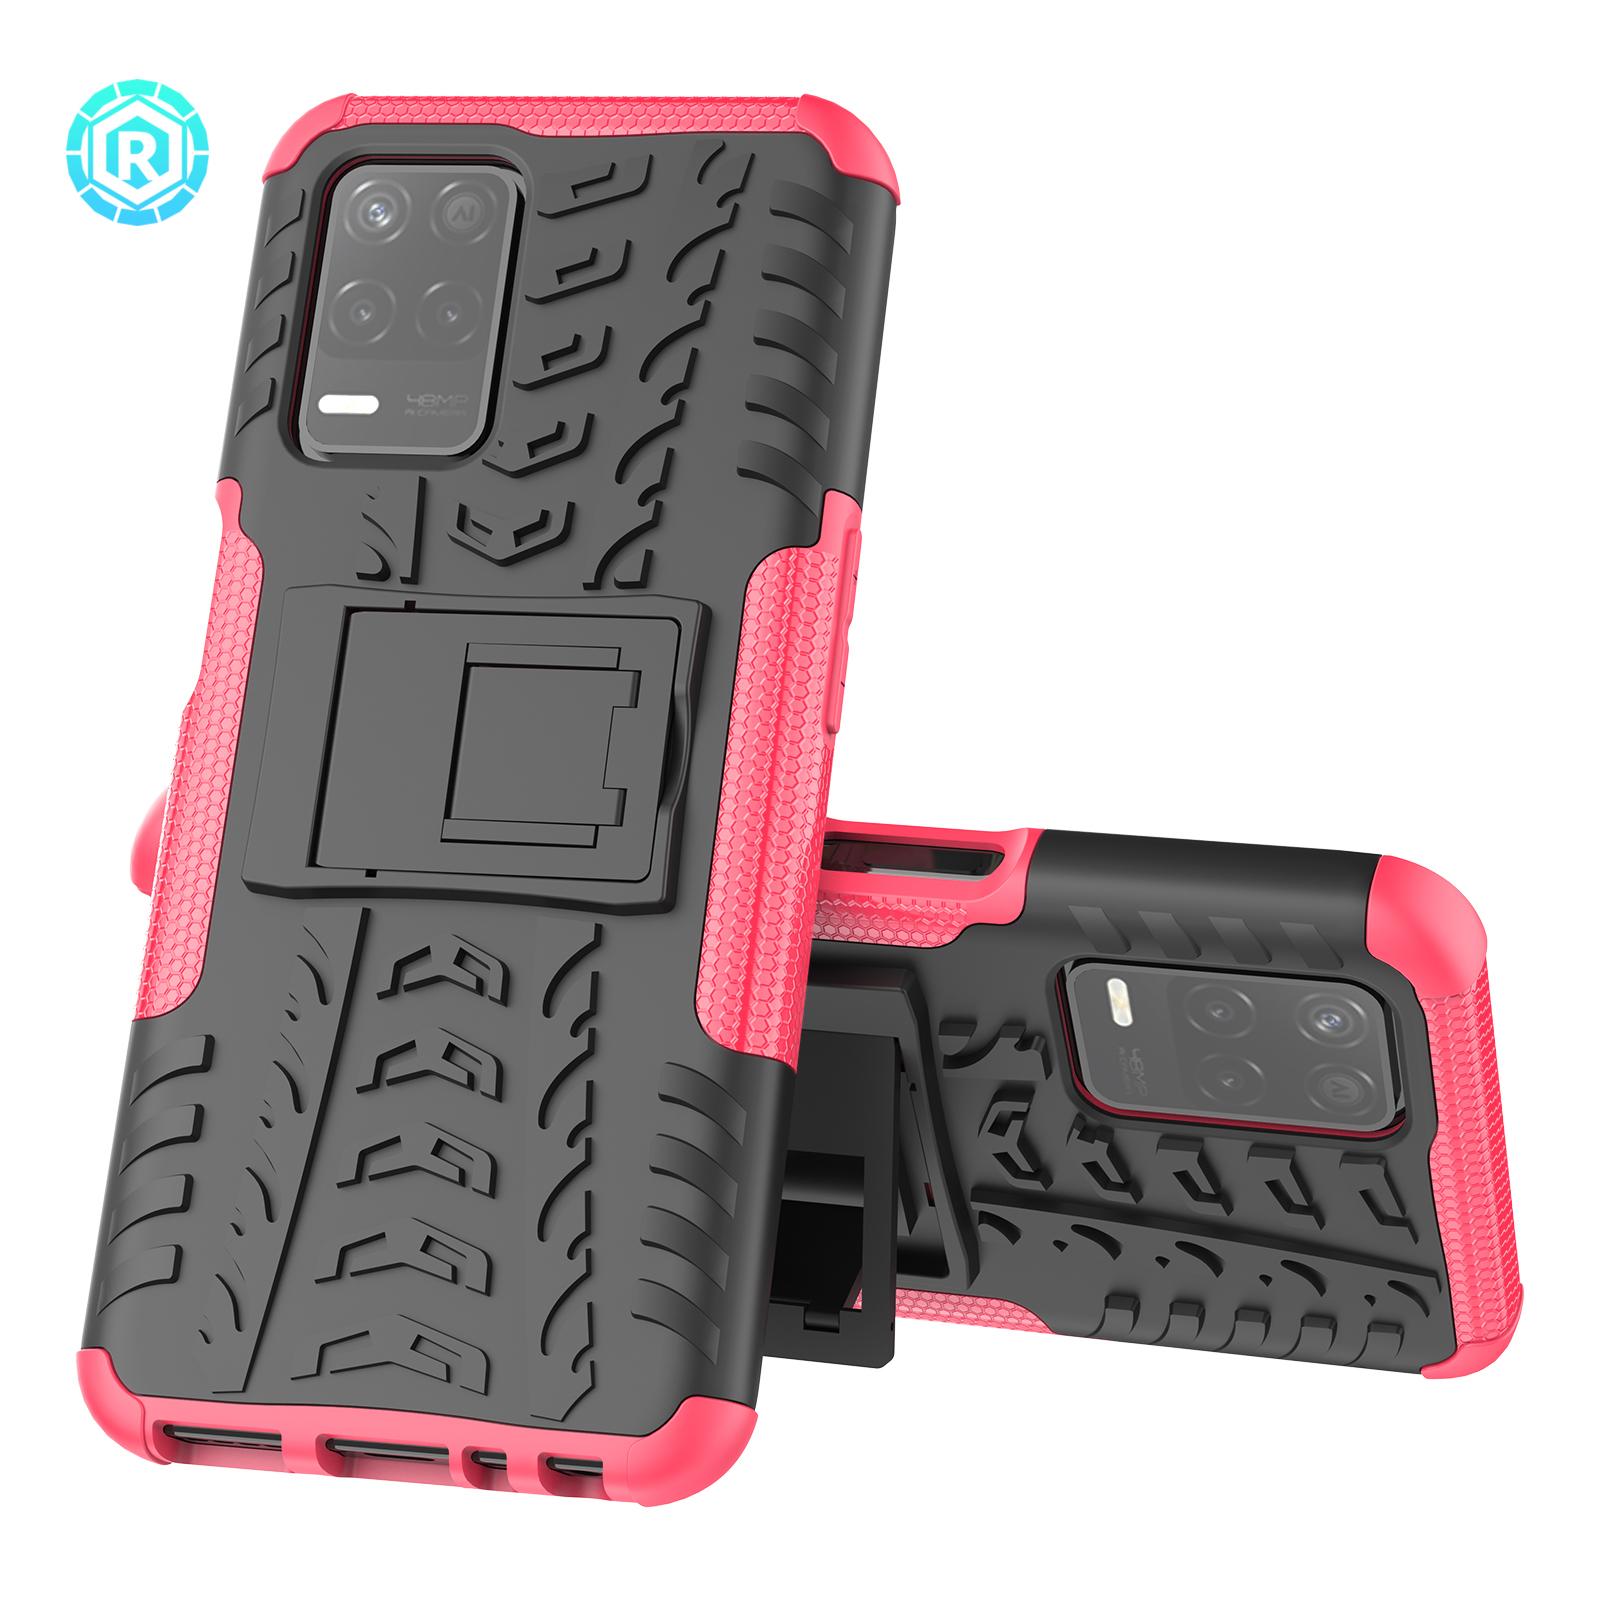 Dazzle Phone Case For Realme V13 5G/8 5G/Q3i 5G